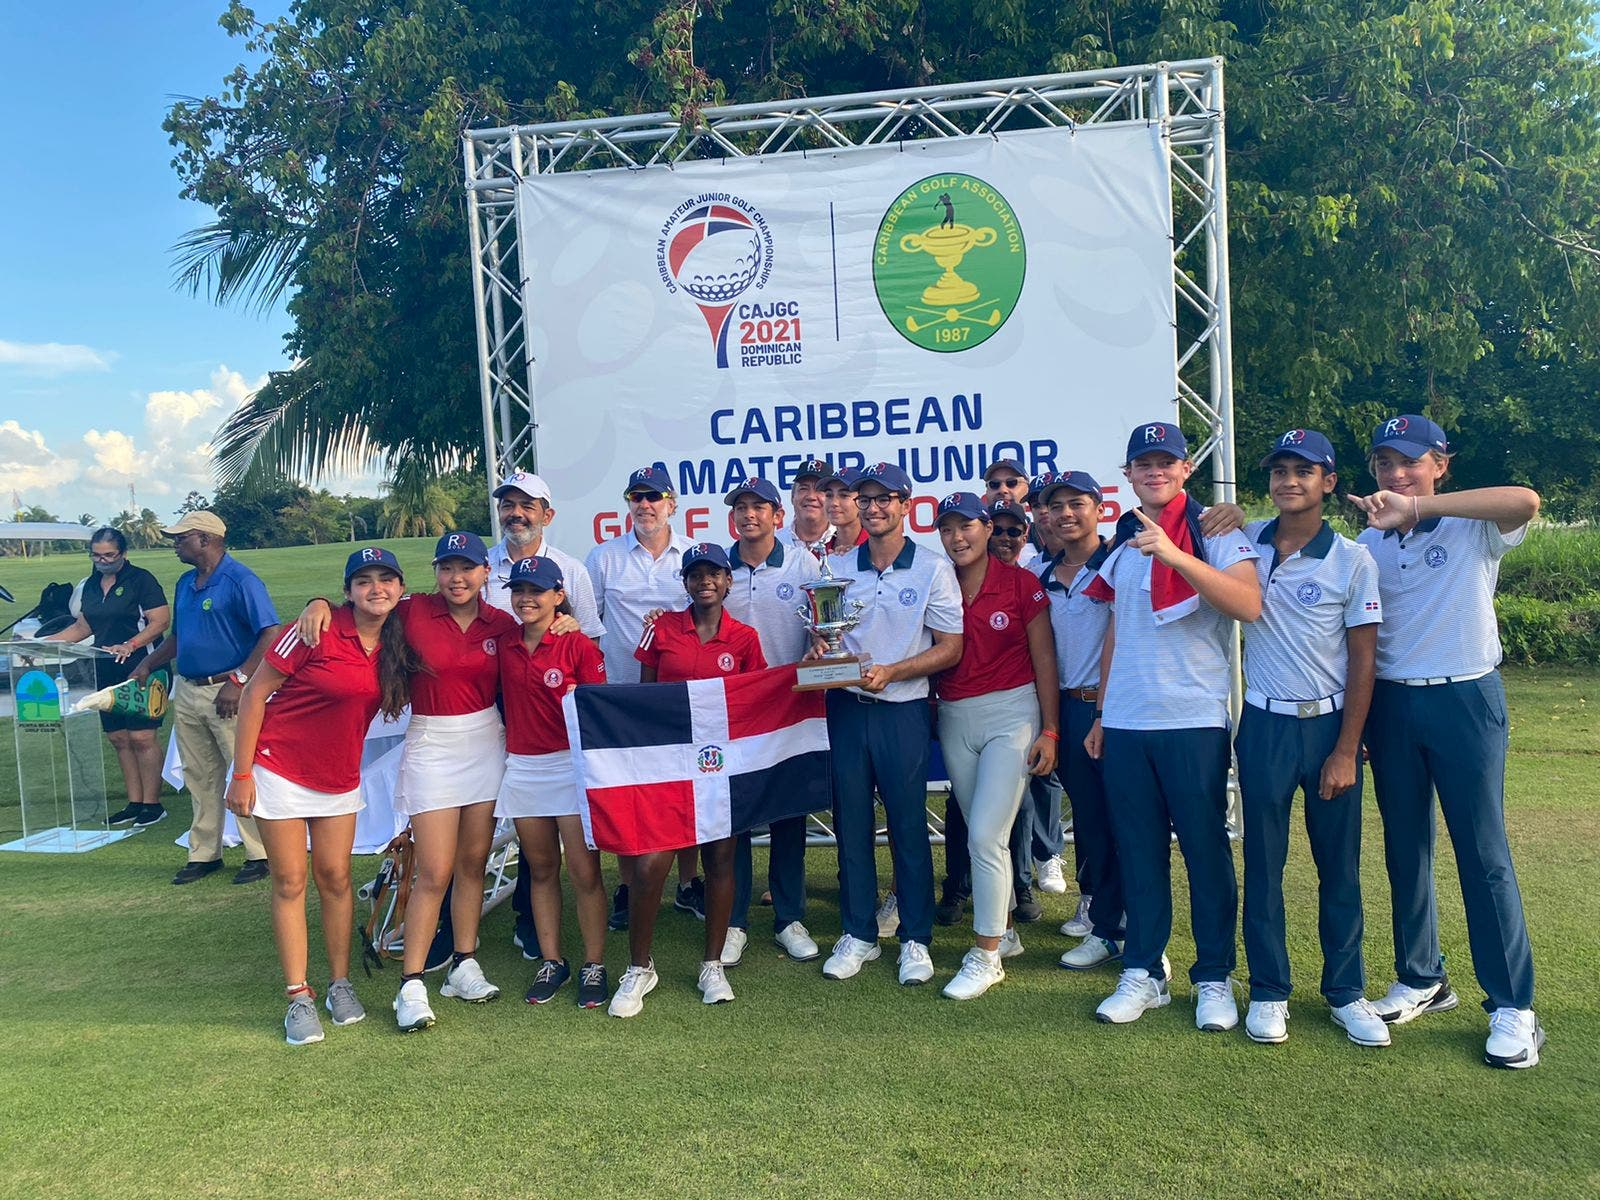 Histórico: RD gana el Caribbean Amateur Junior Golf Championships